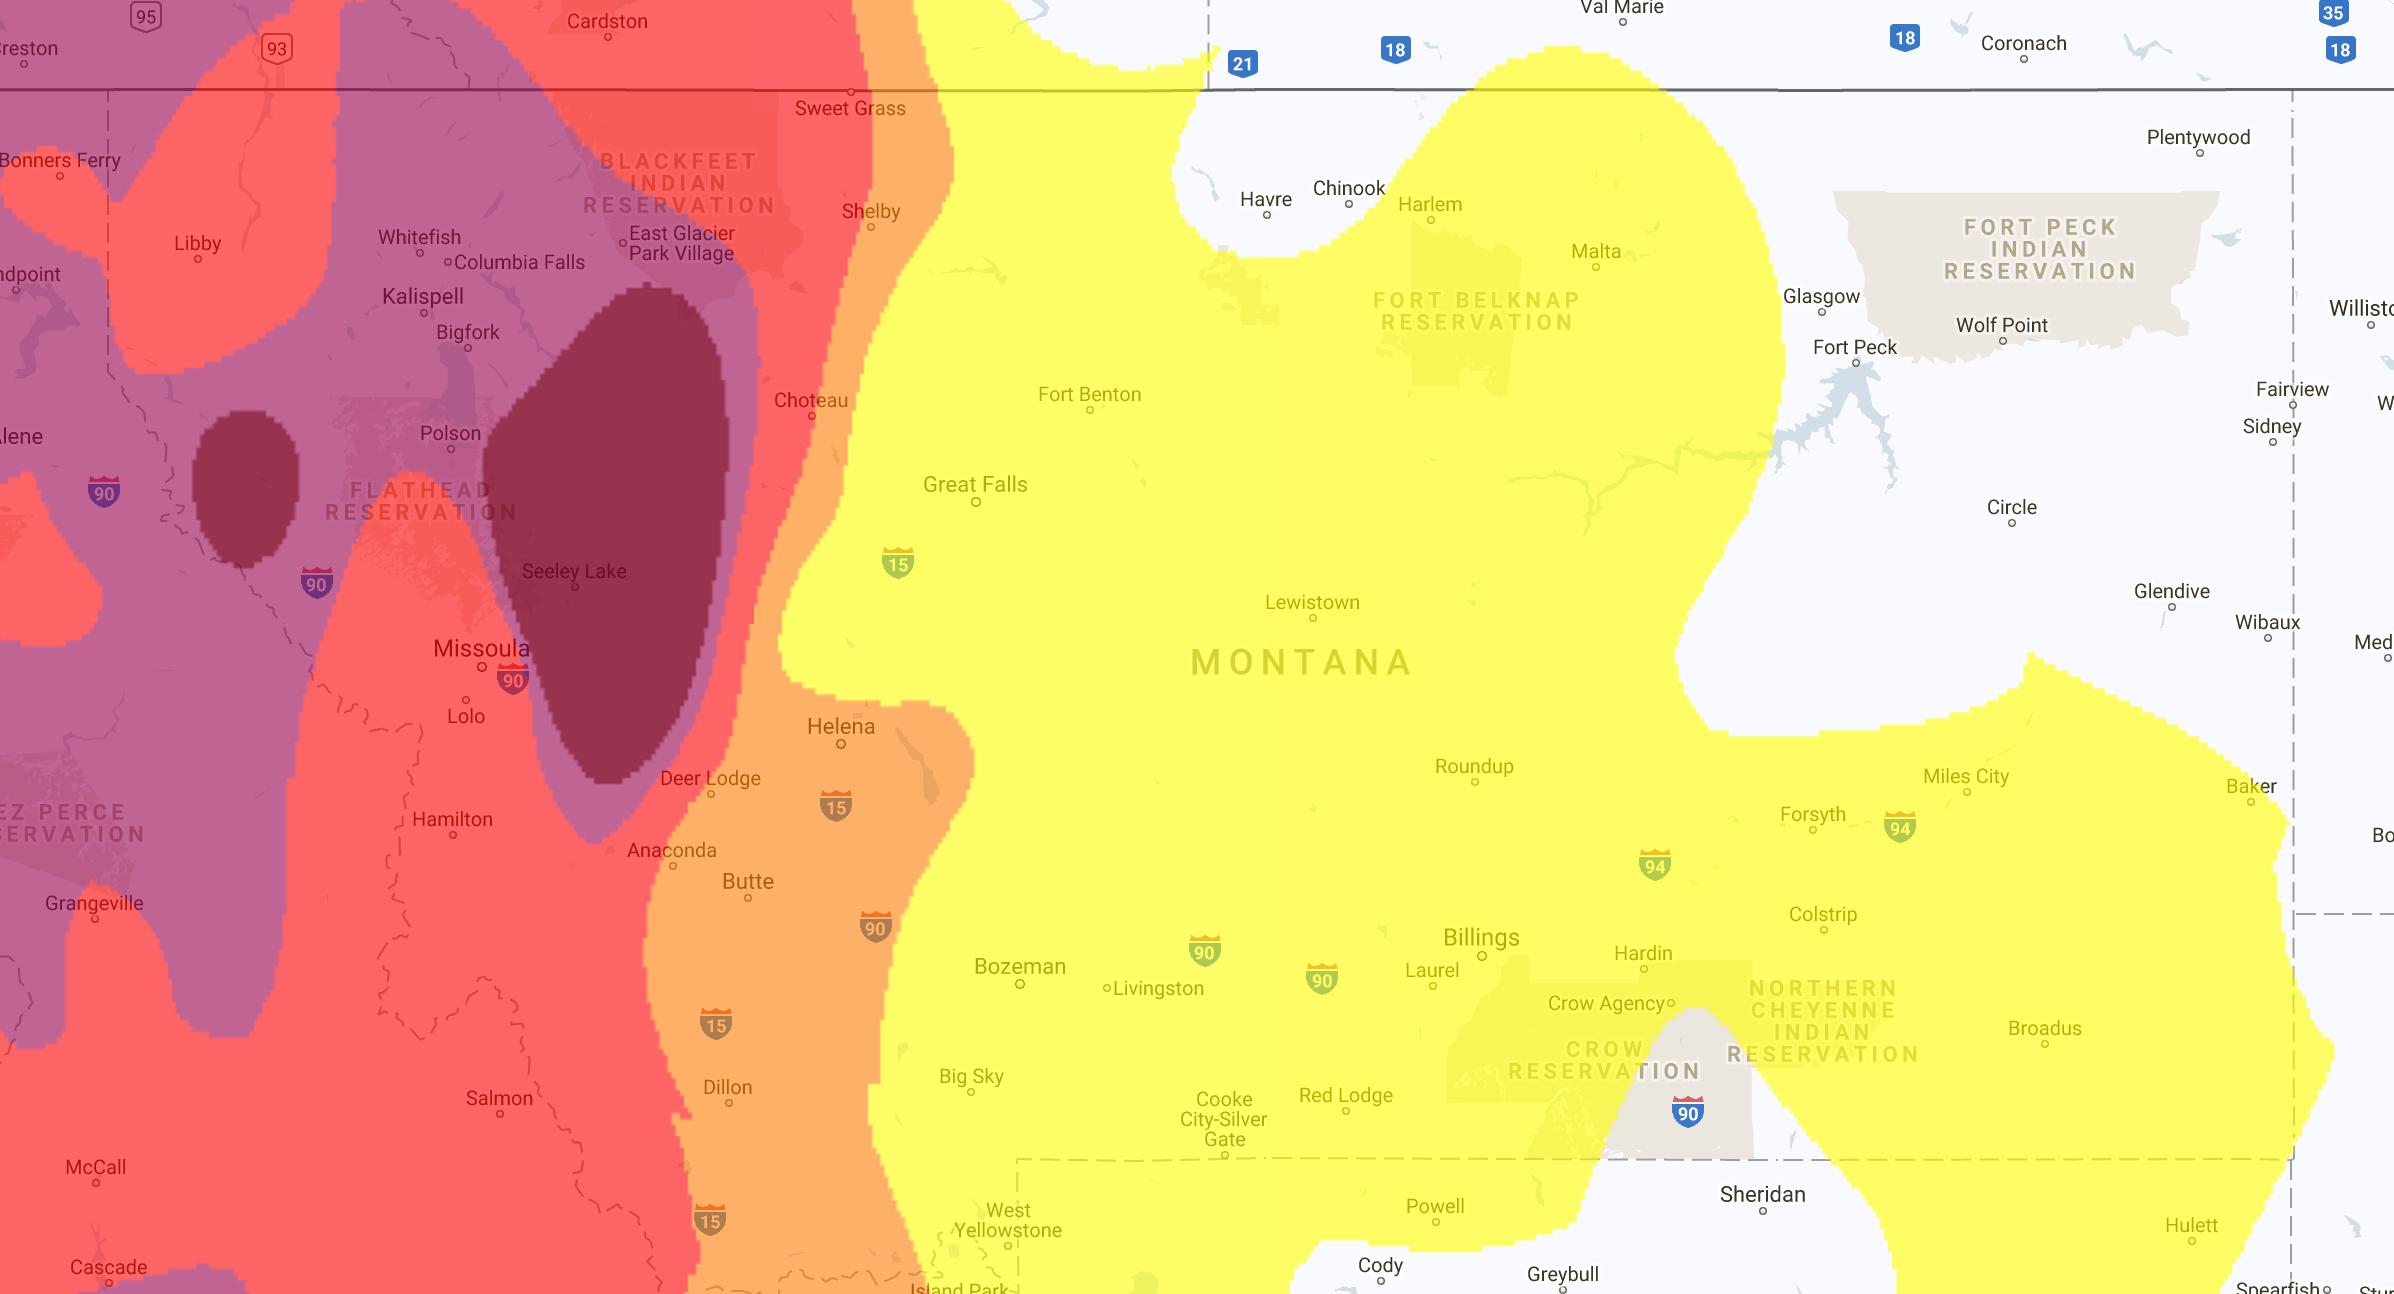 Air Pollution Maps Of The United States NextBigFuturecom